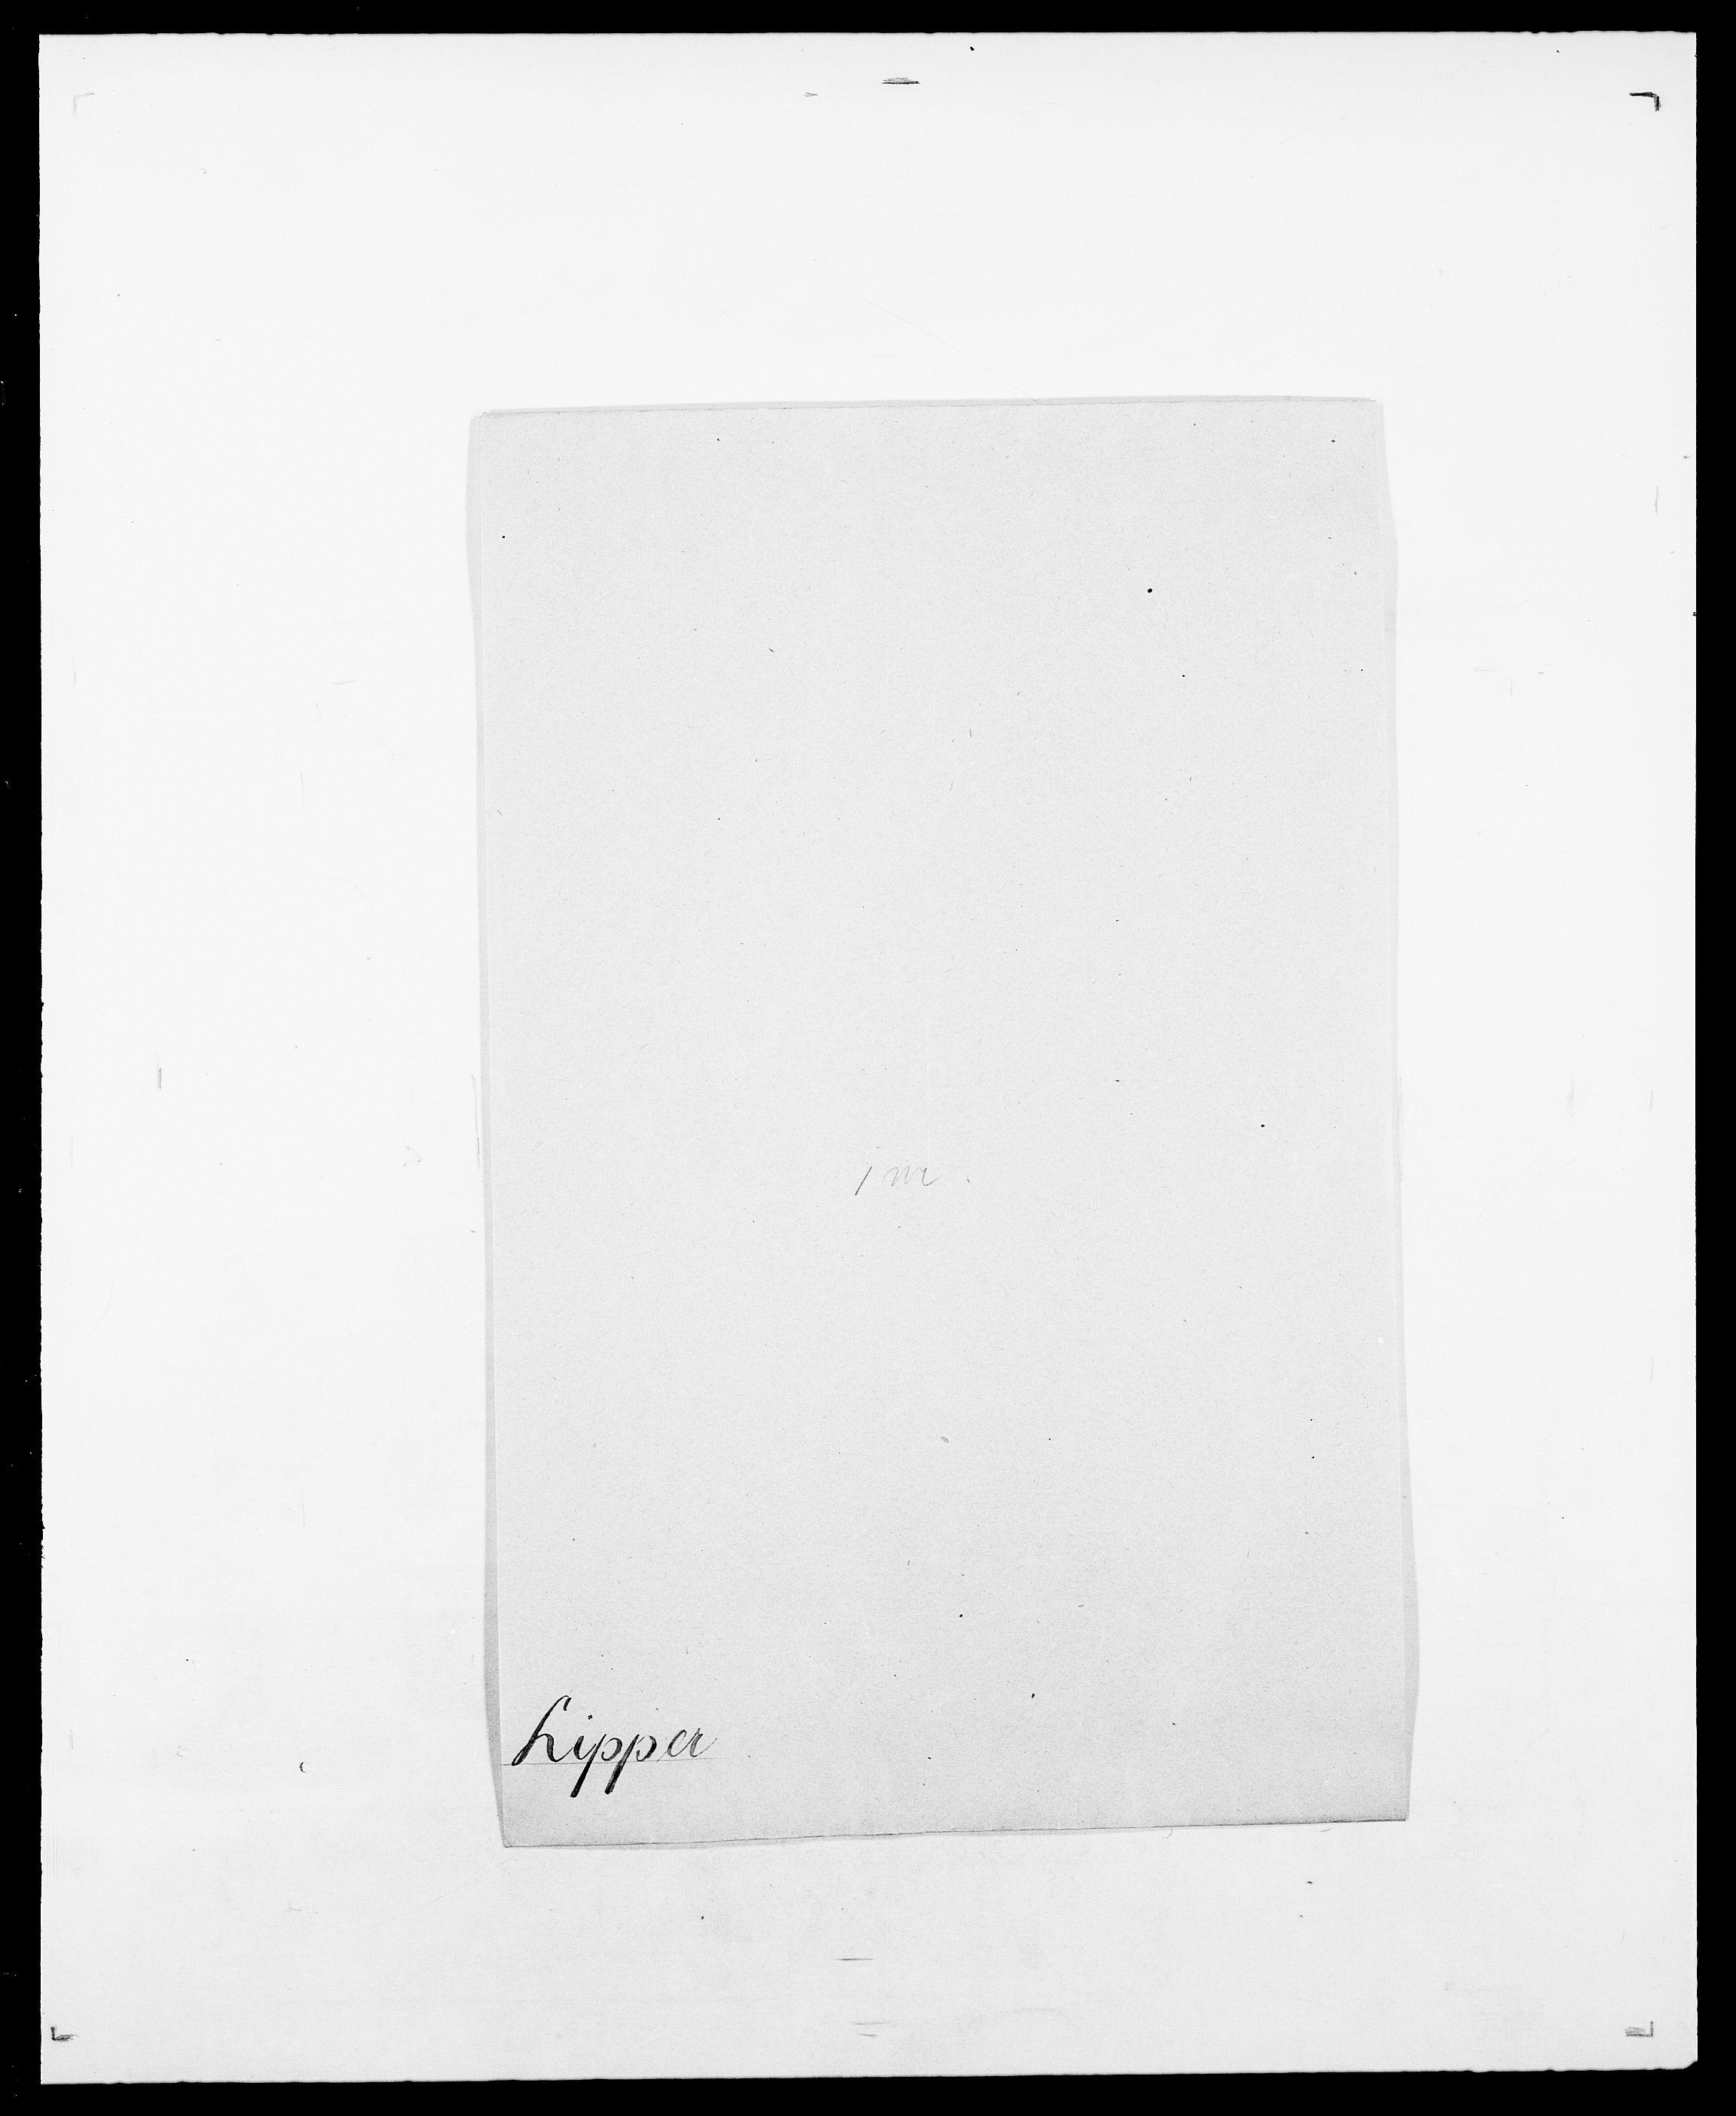 SAO, Delgobe, Charles Antoine - samling, D/Da/L0023: Lau - Lirvyn, s. 692